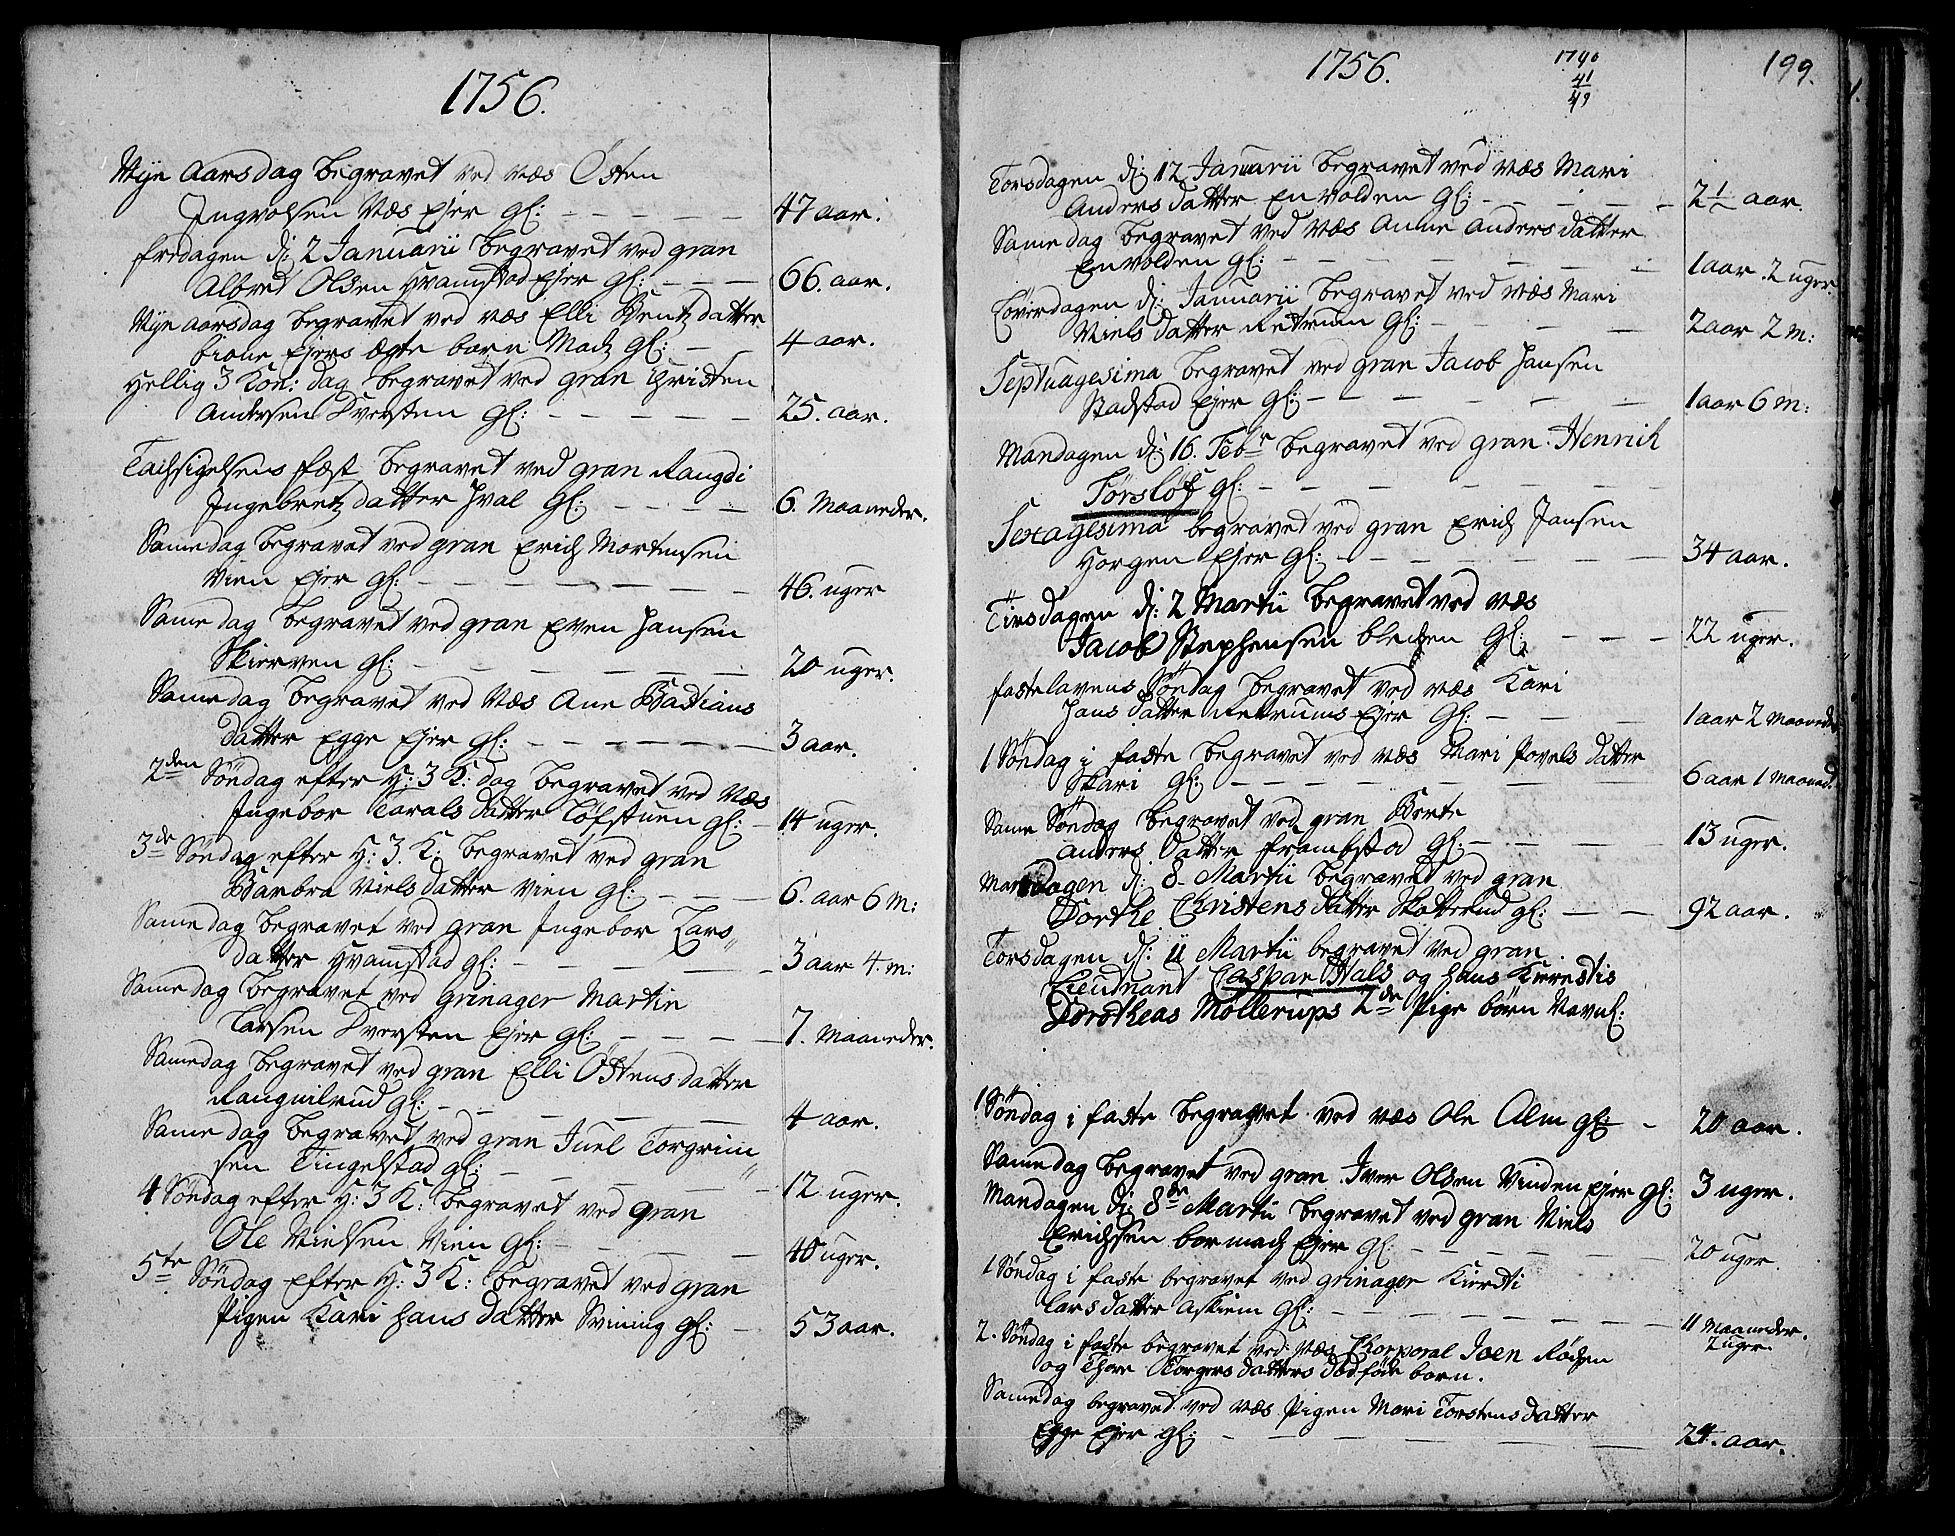 SAH, Gran prestekontor, Ministerialbok nr. 3, 1745-1758, s. 199